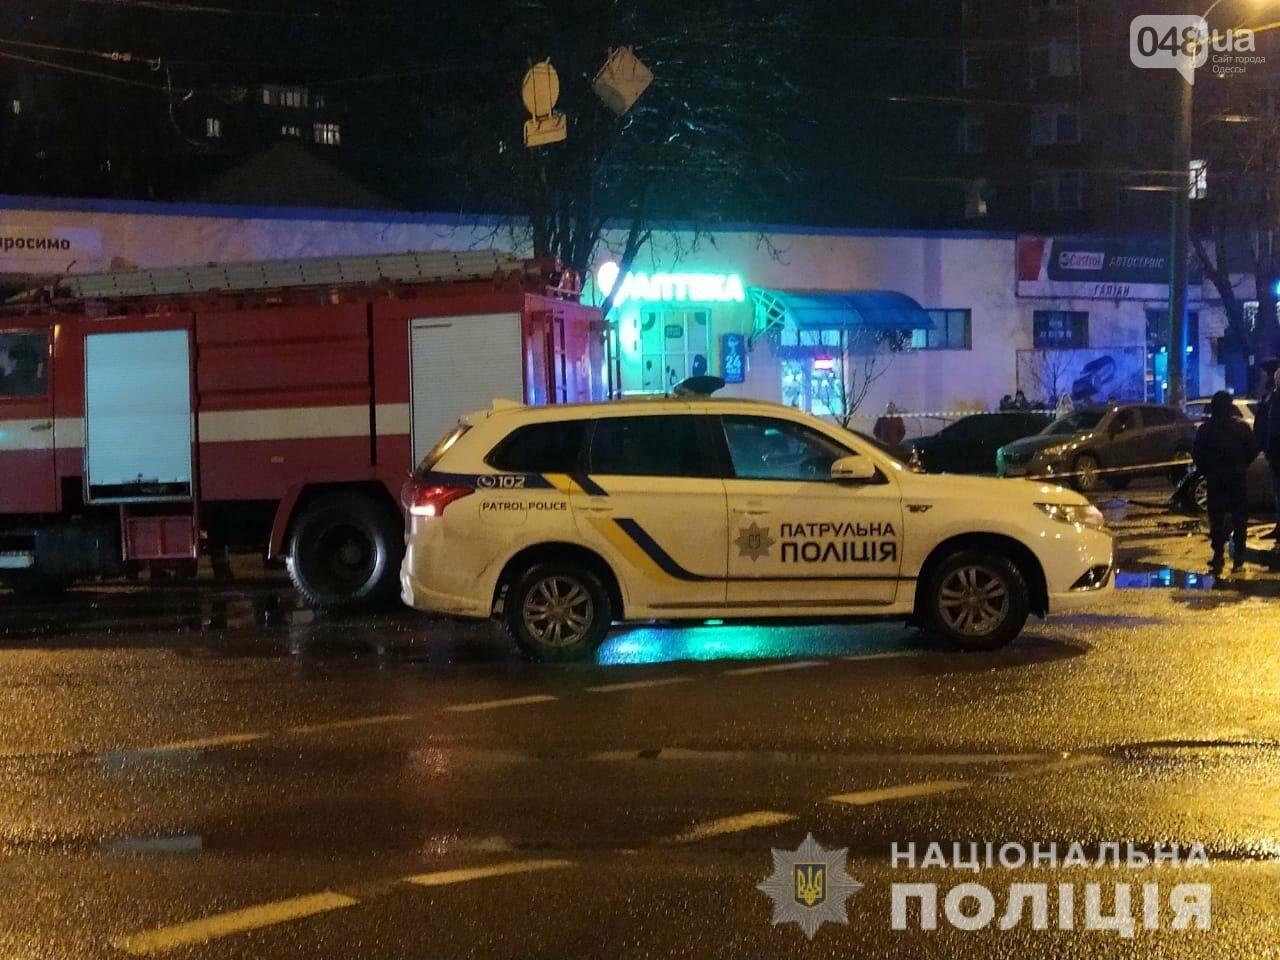 В Одессе в ночном ДТП погибли два человека, - ФОТО, ВИДЕО, ОБНОВЛЕНО, фото-7